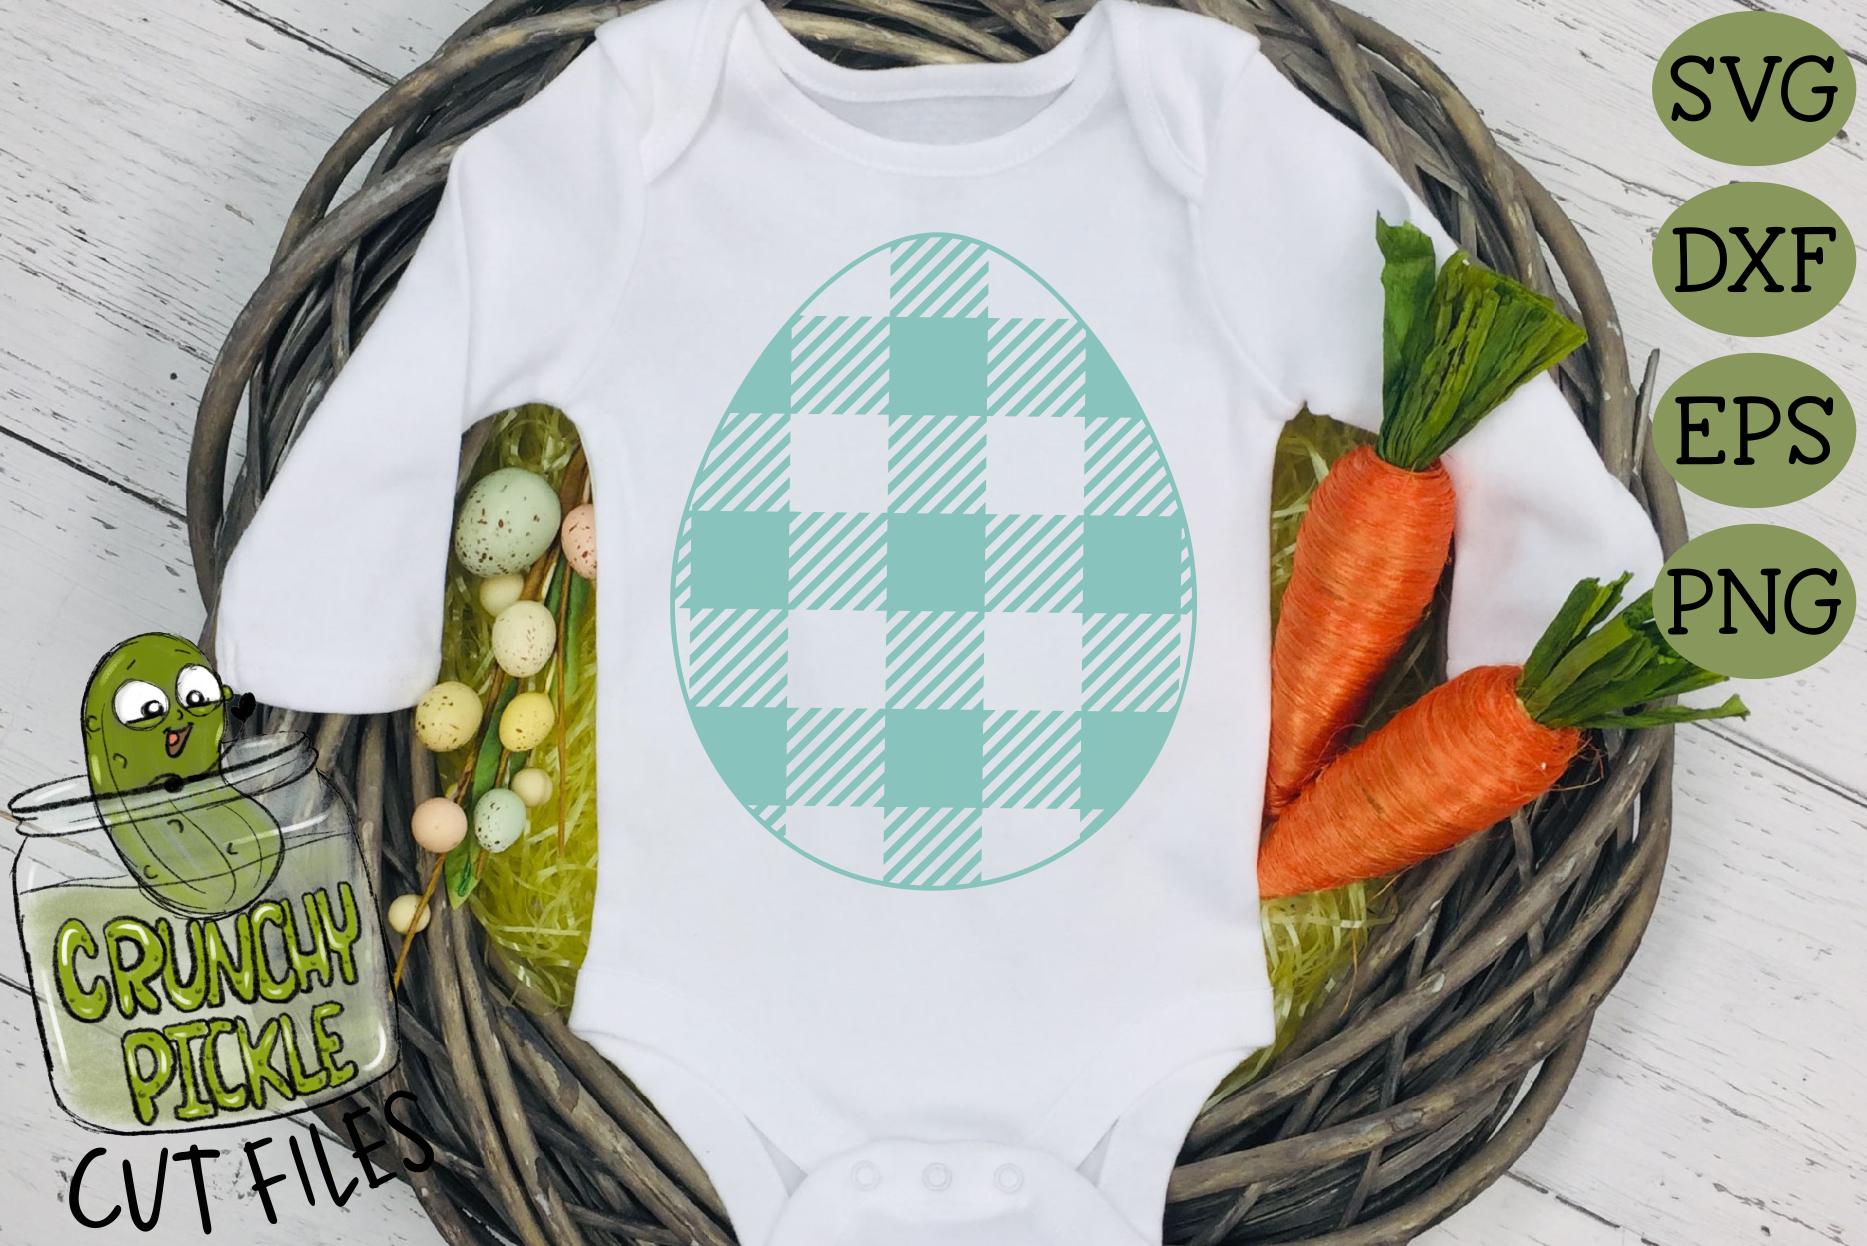 Plaid & Grunge Spring Easter Egg SVG Cut File example image 2